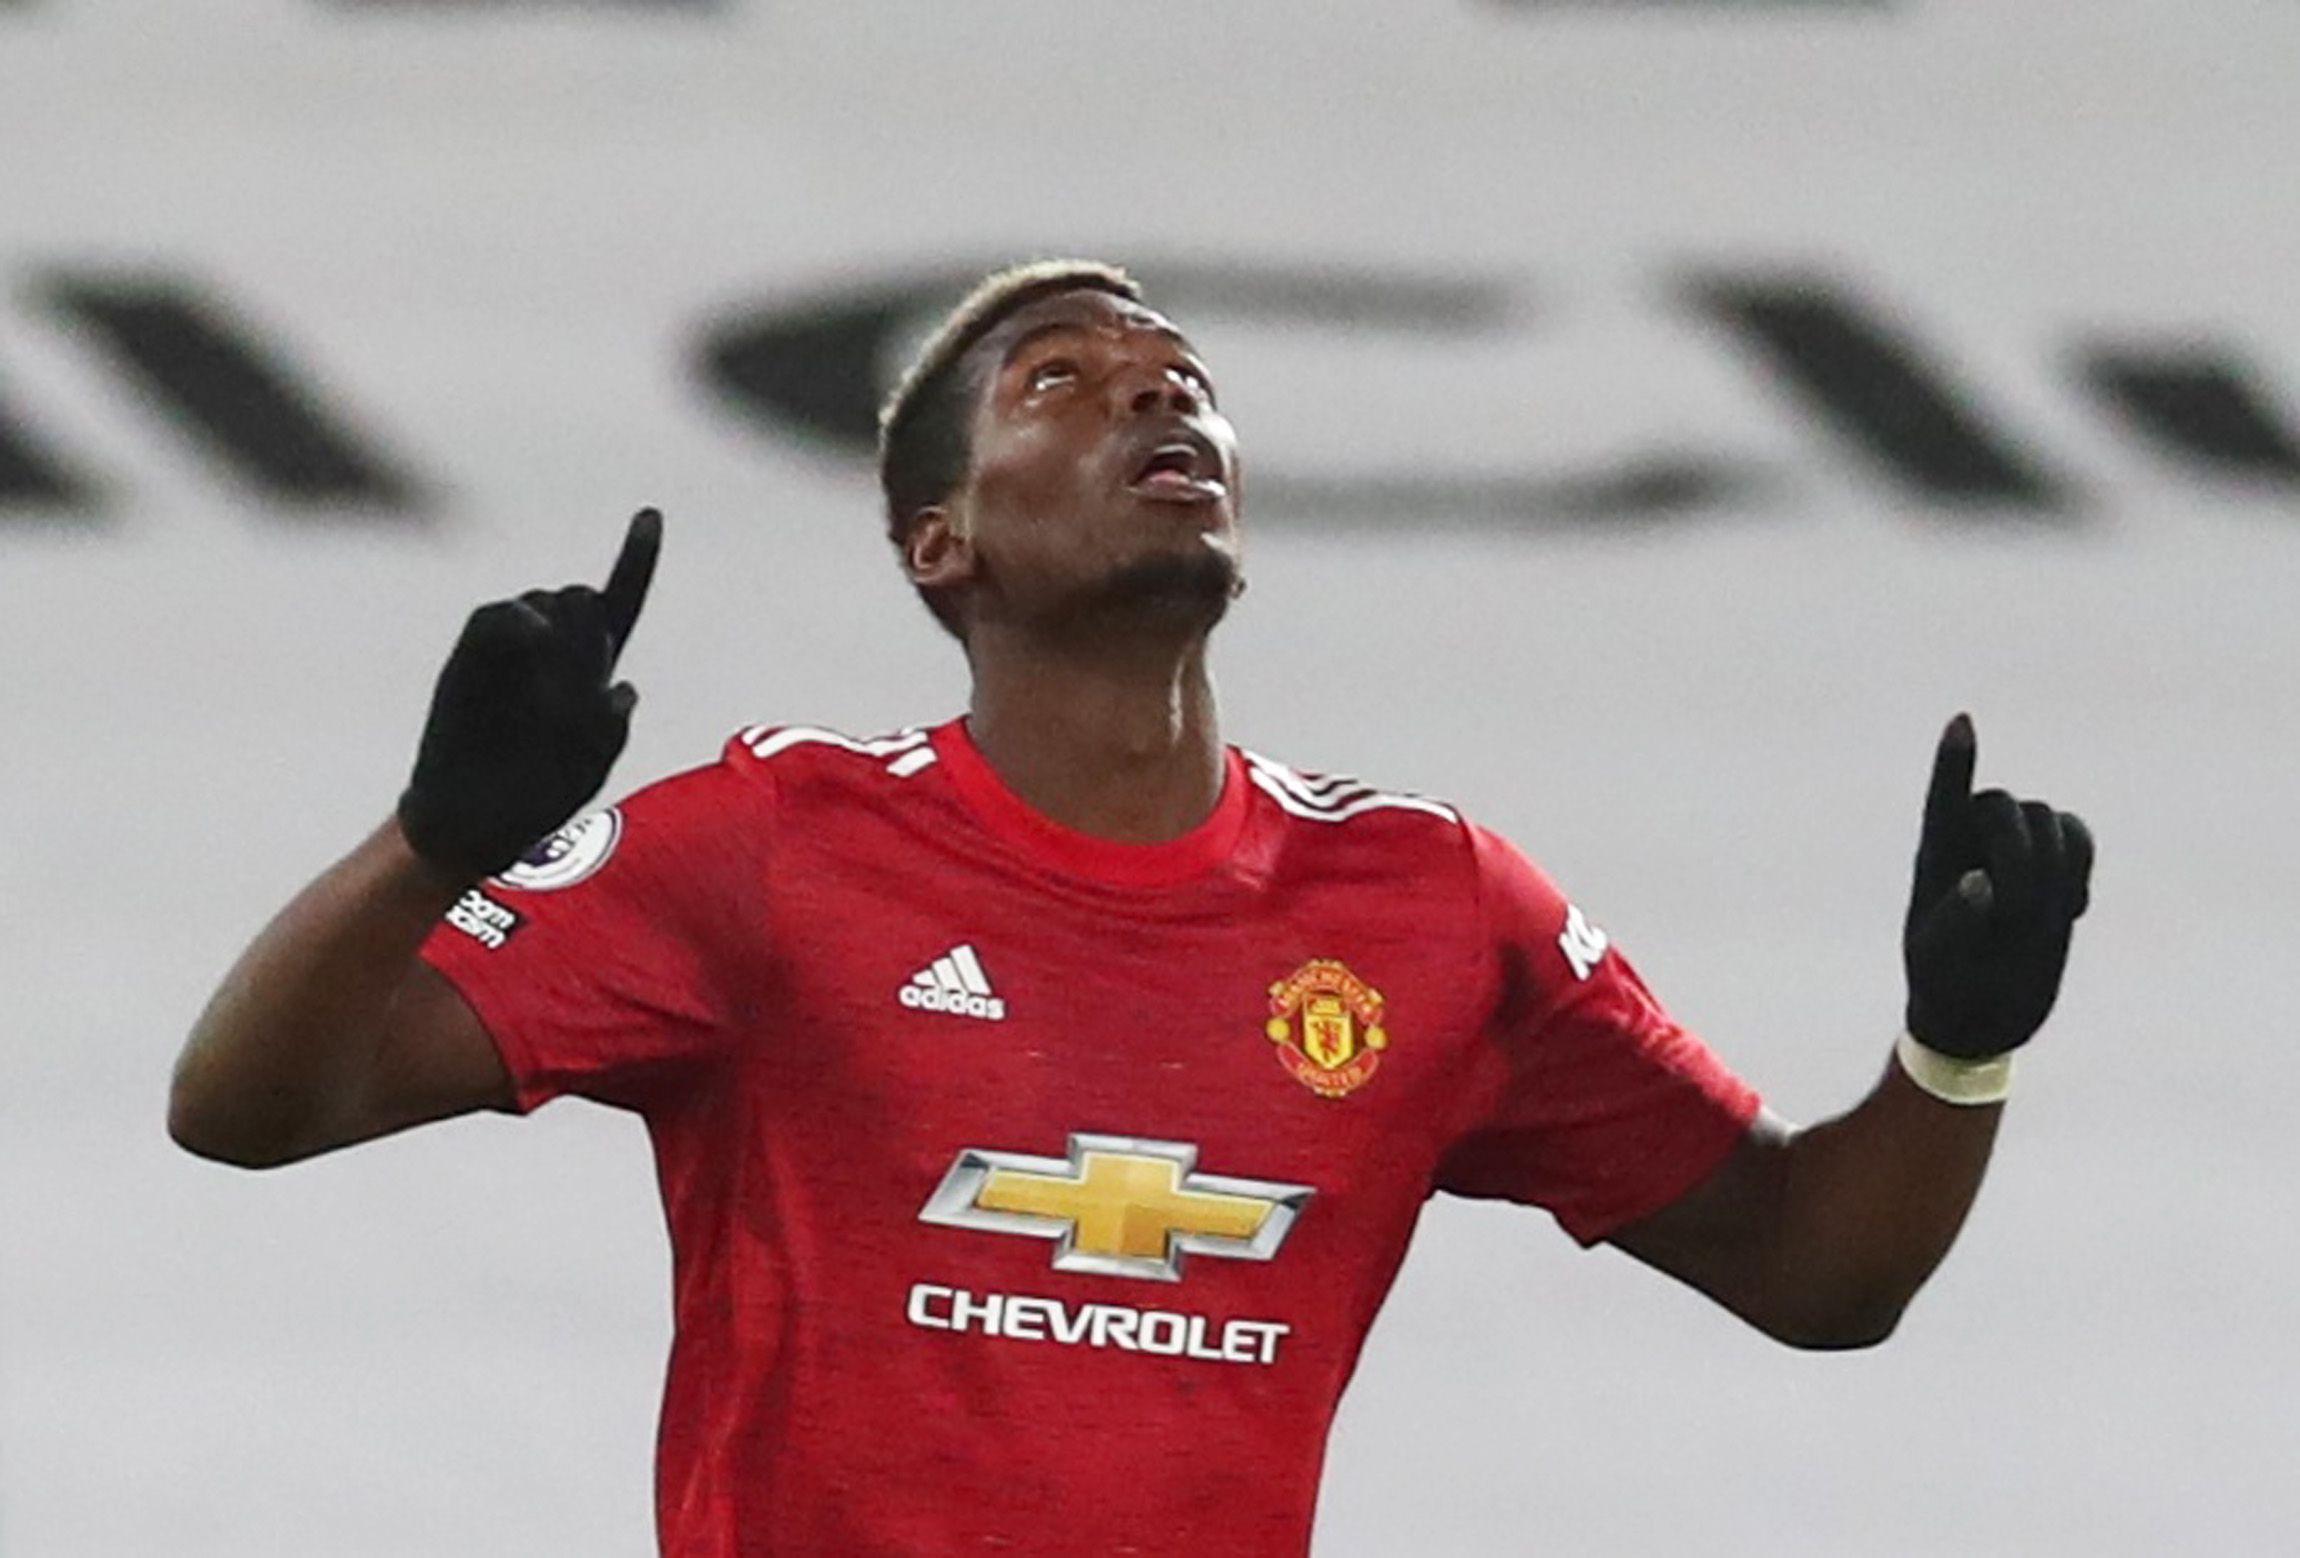 5) Paul Pogba, Manchester United, USD 20,66 millones